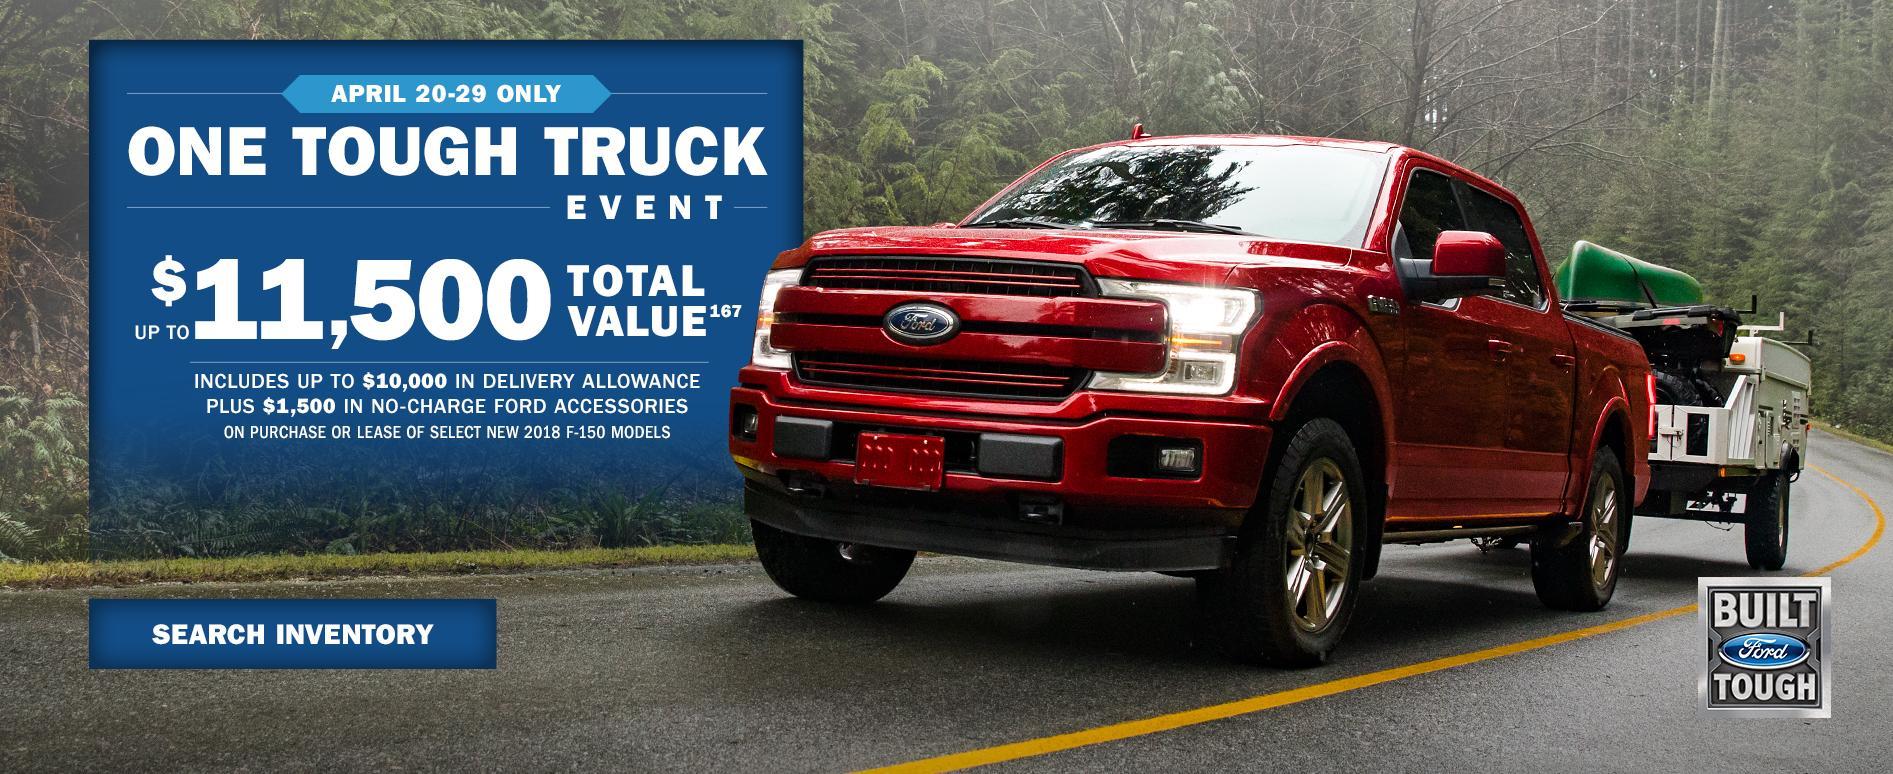 Killaloe Ford Dealer | New & Used Cars, Trucks & SUVs | Summers Bros.